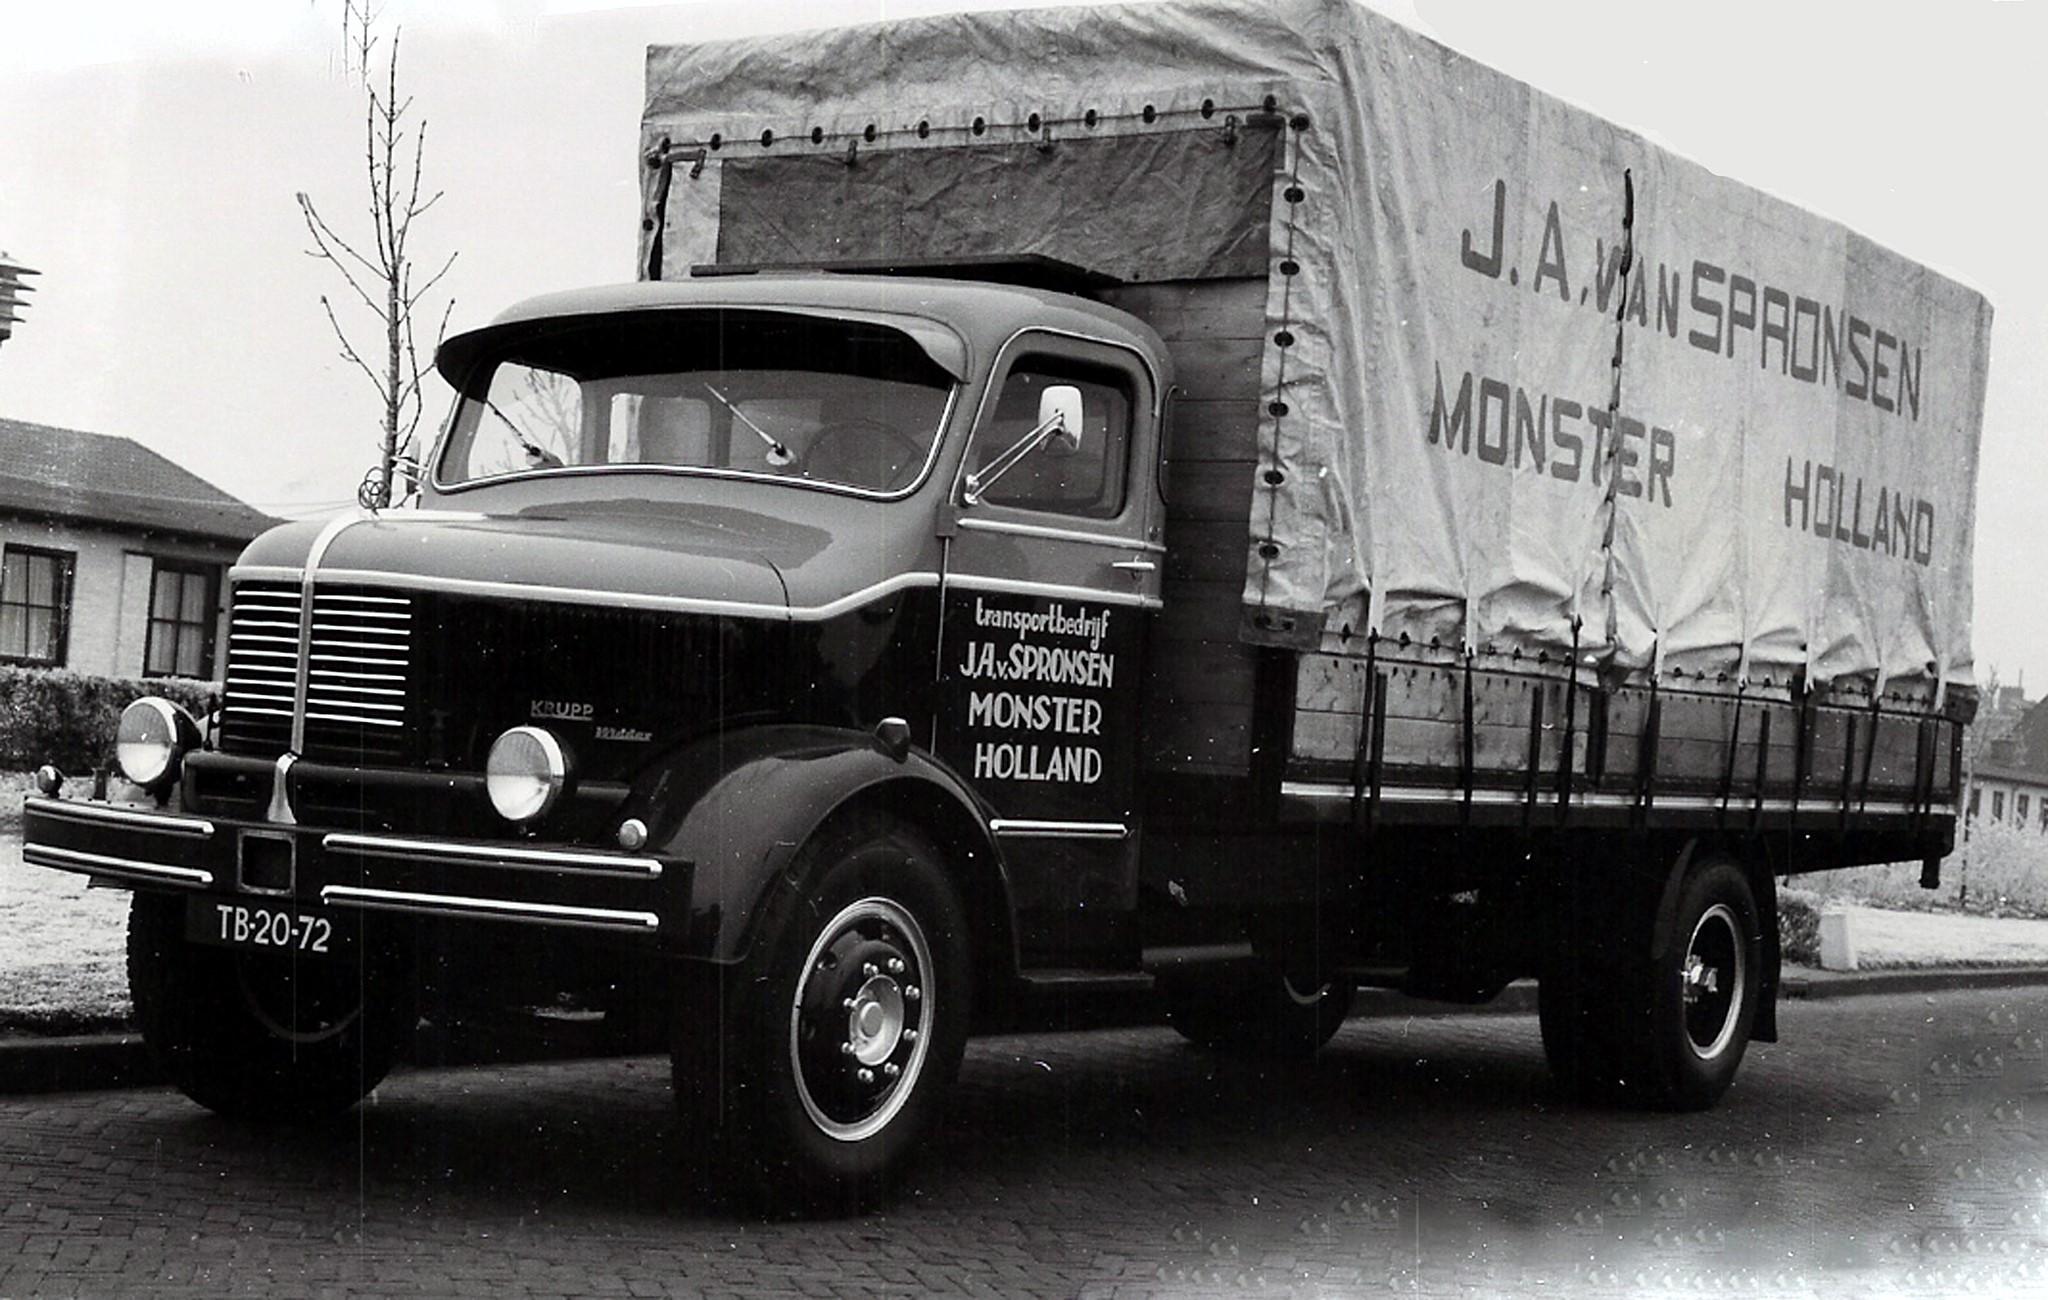 Krupp-Wider-3-Cyl.-Gerrit-Boers-archief-met-en-zonder-AHW--1